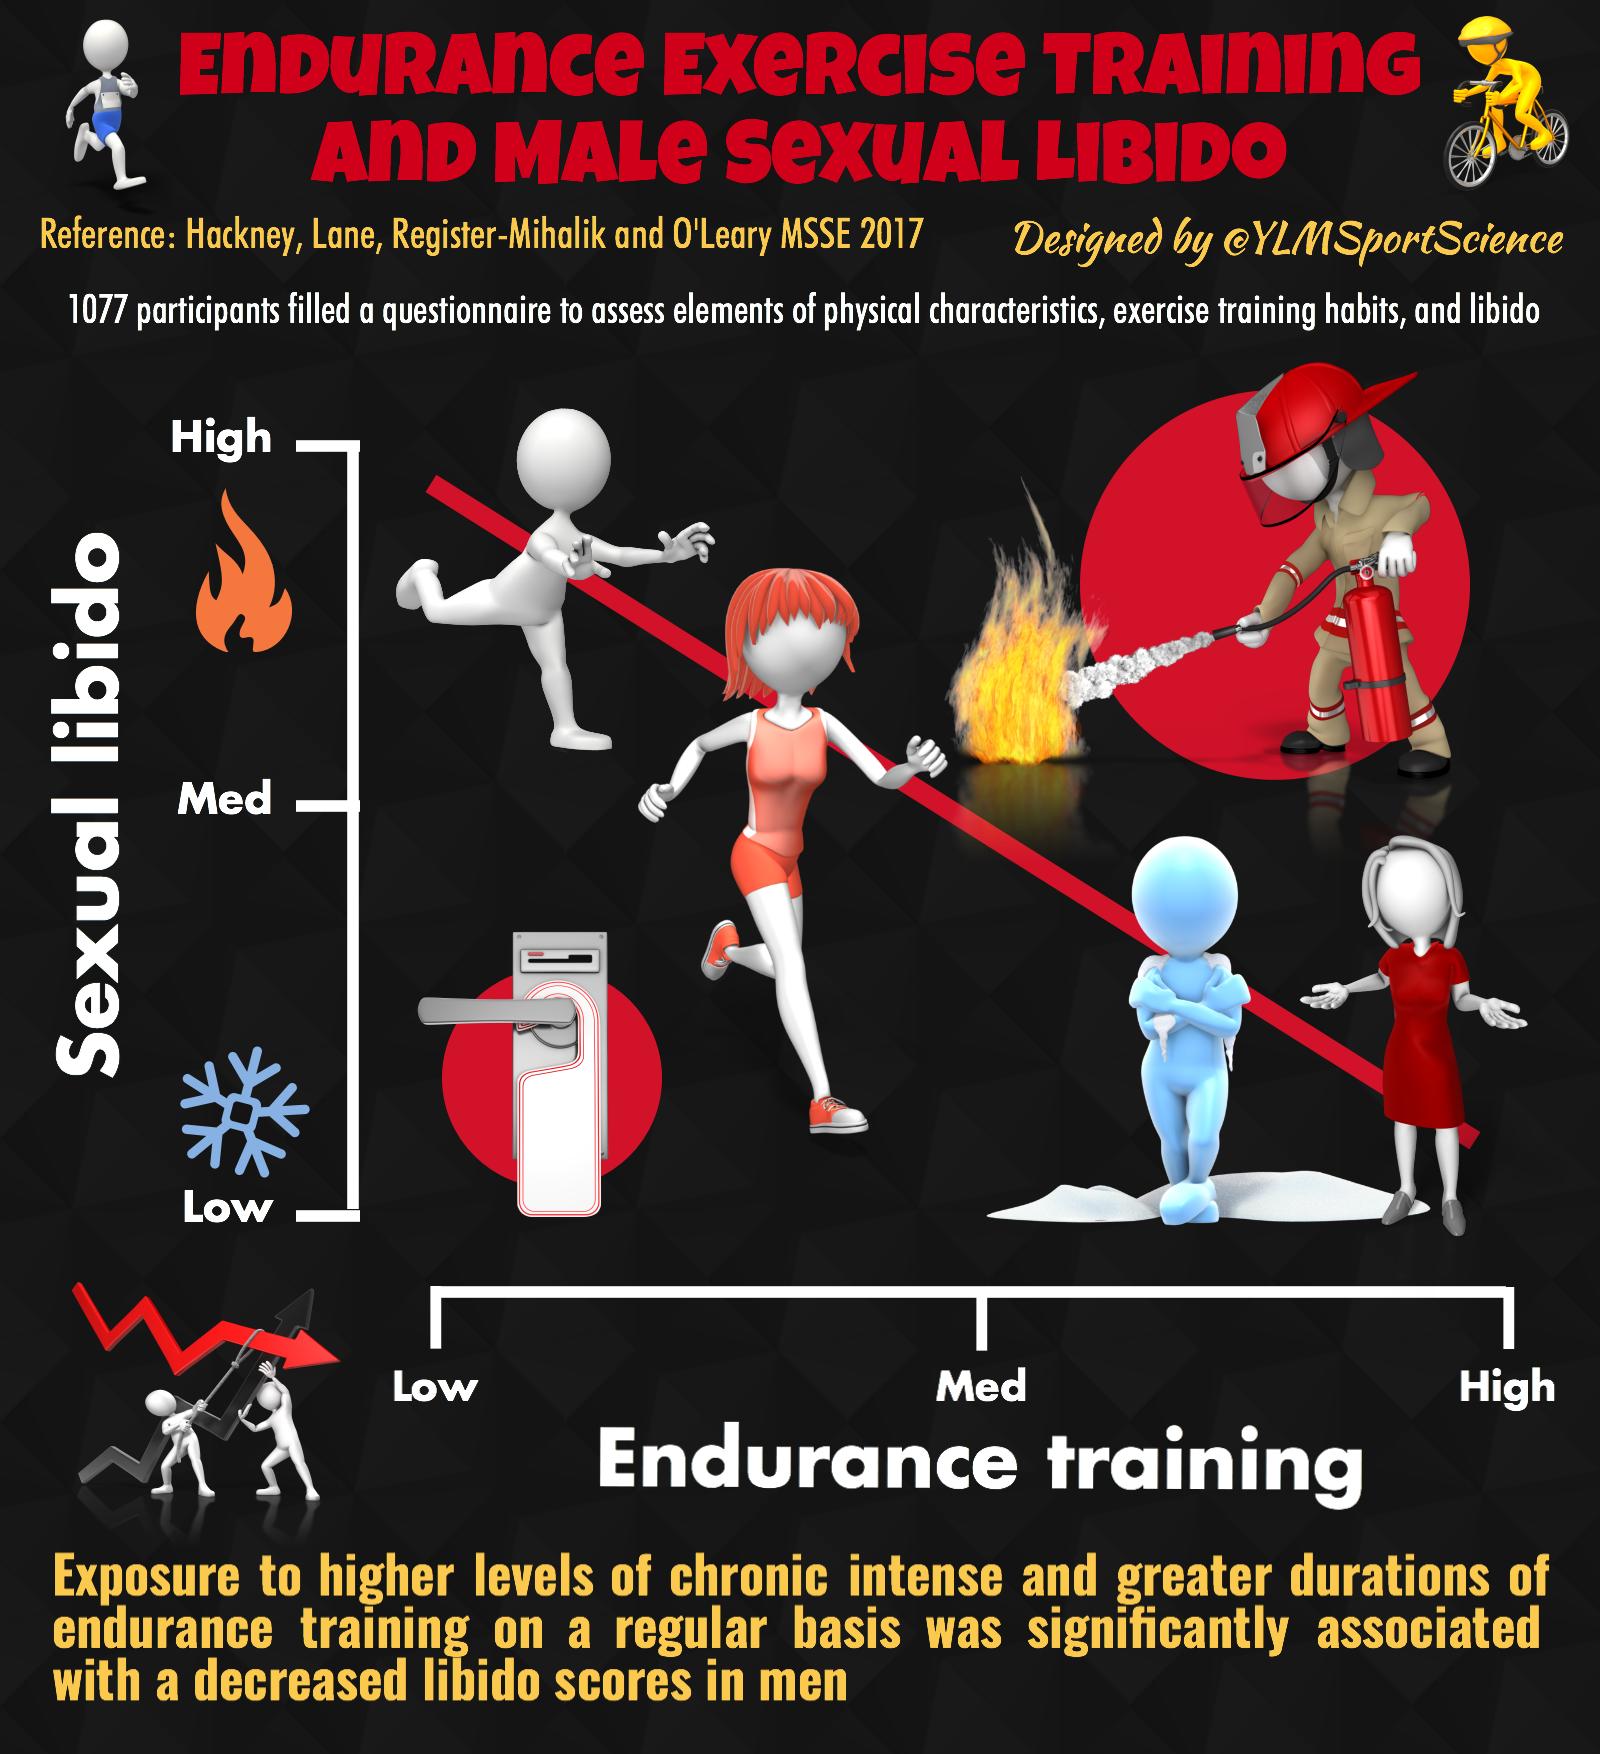 Sexual endurance training